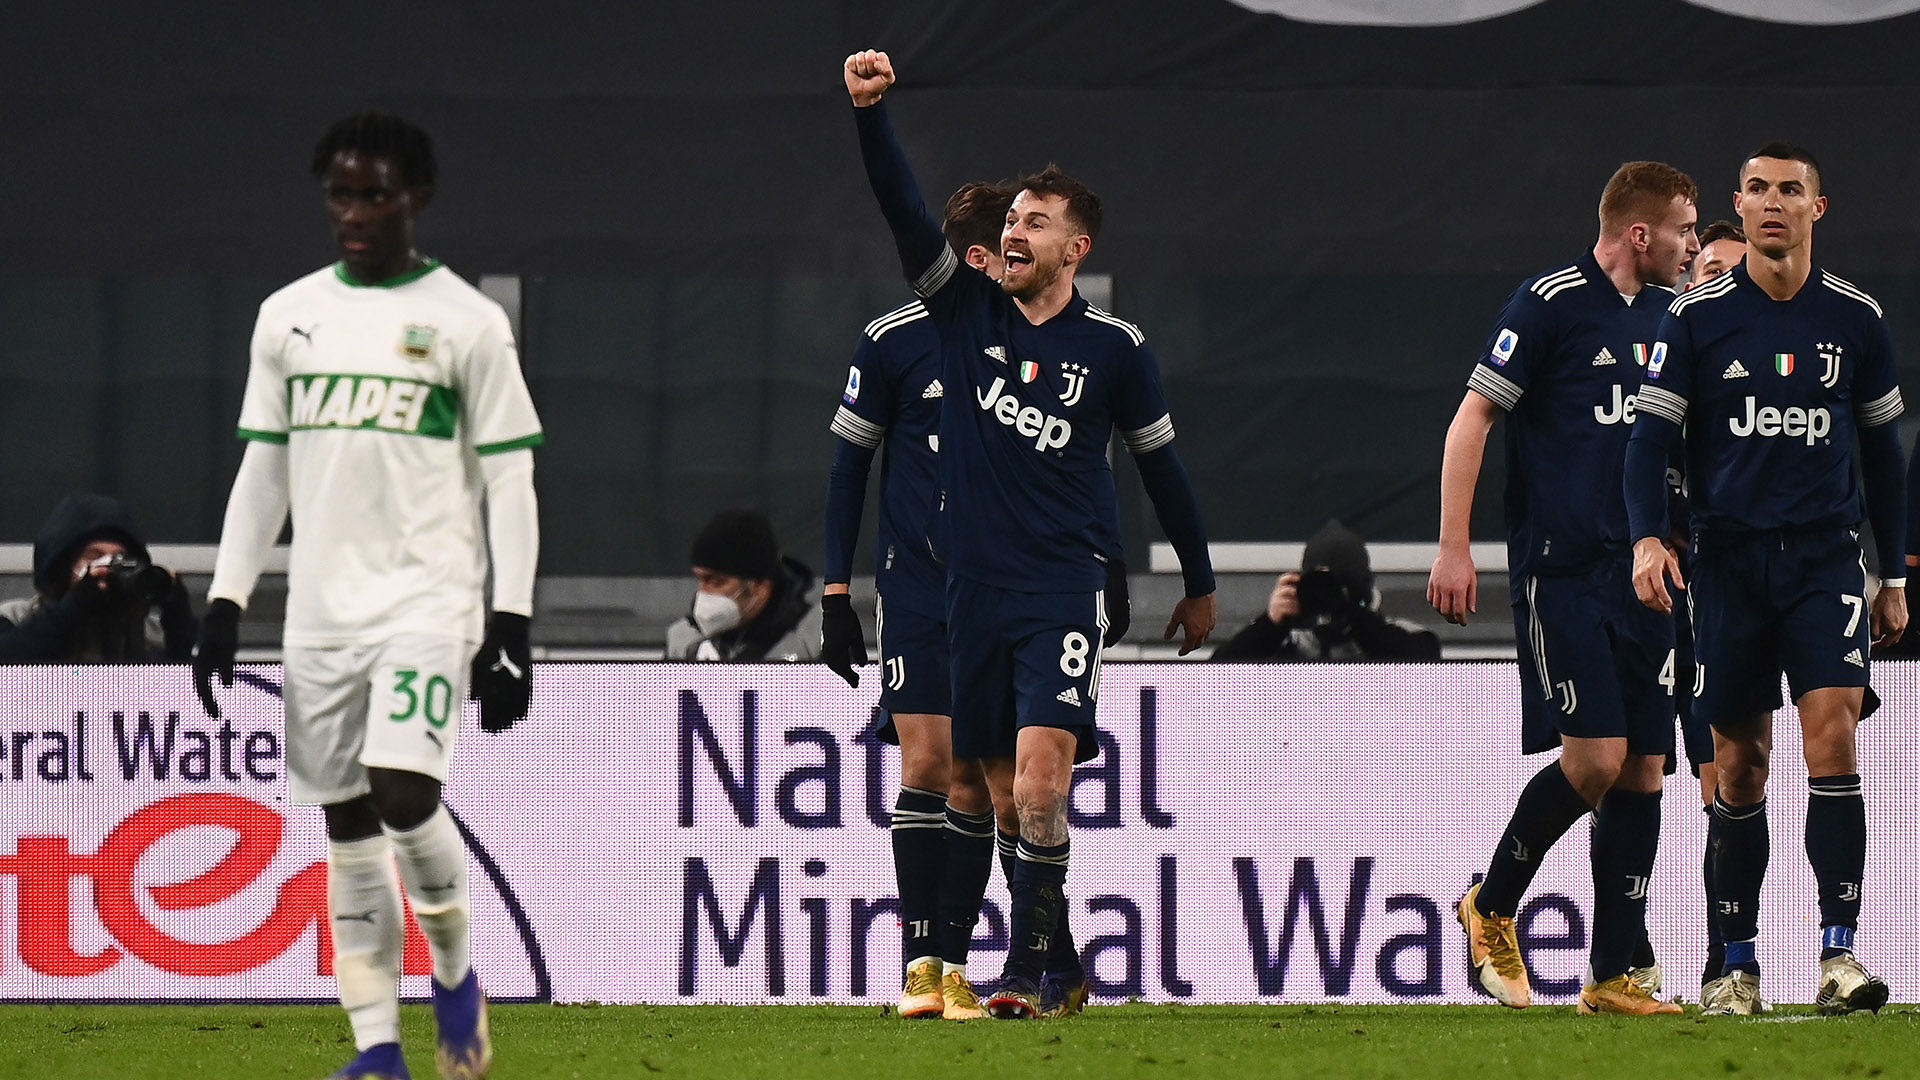 Serie A: Juventus-Sassuolo 3-1, le foto - Serie A: Juventus-Sassuolo 3-1,  le foto   Virgilio Sport